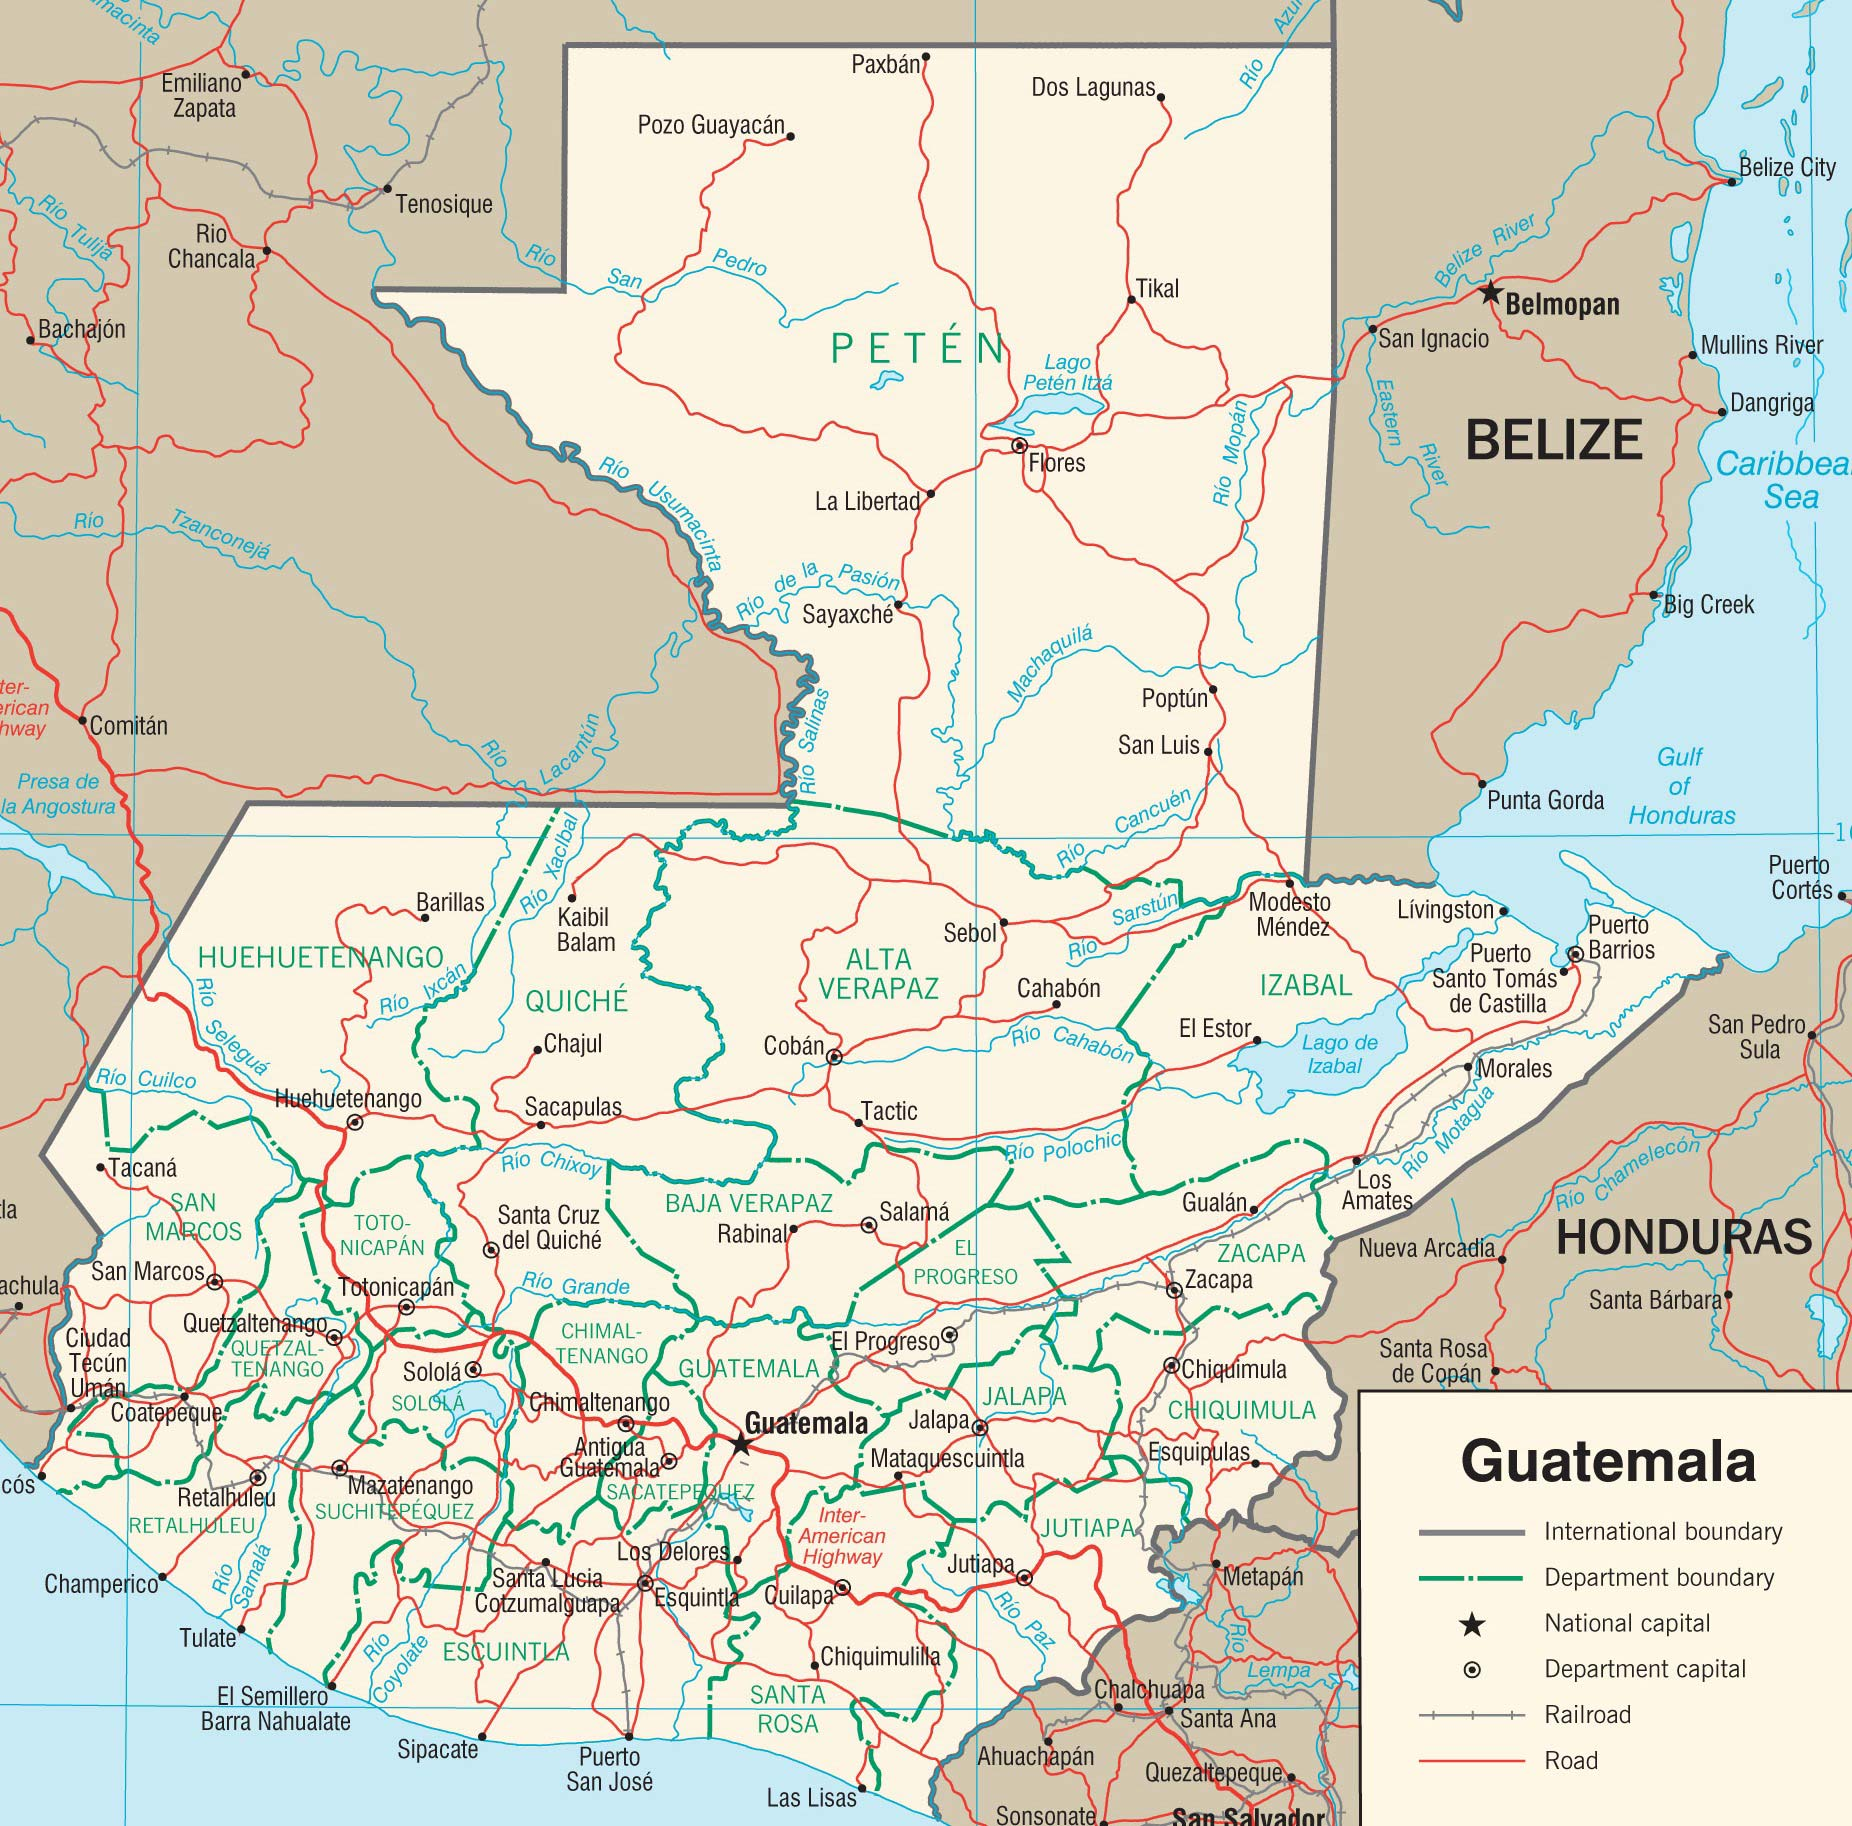 Carreteras importantes de Guatemala